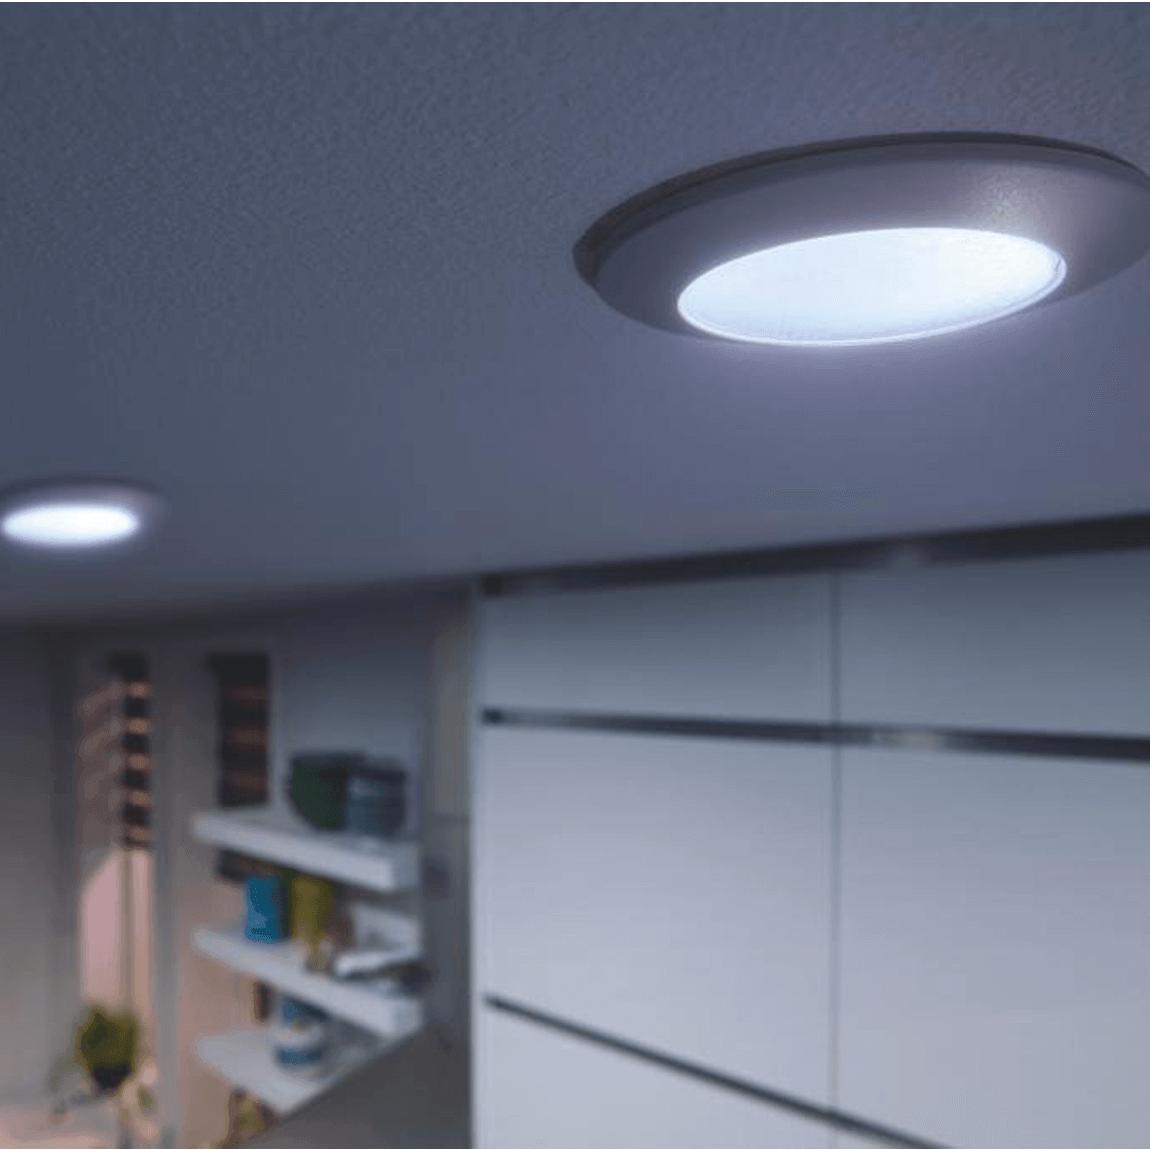 philips hue phoenix led spot 447lm lampen smarte leuchtmittel licht. Black Bedroom Furniture Sets. Home Design Ideas